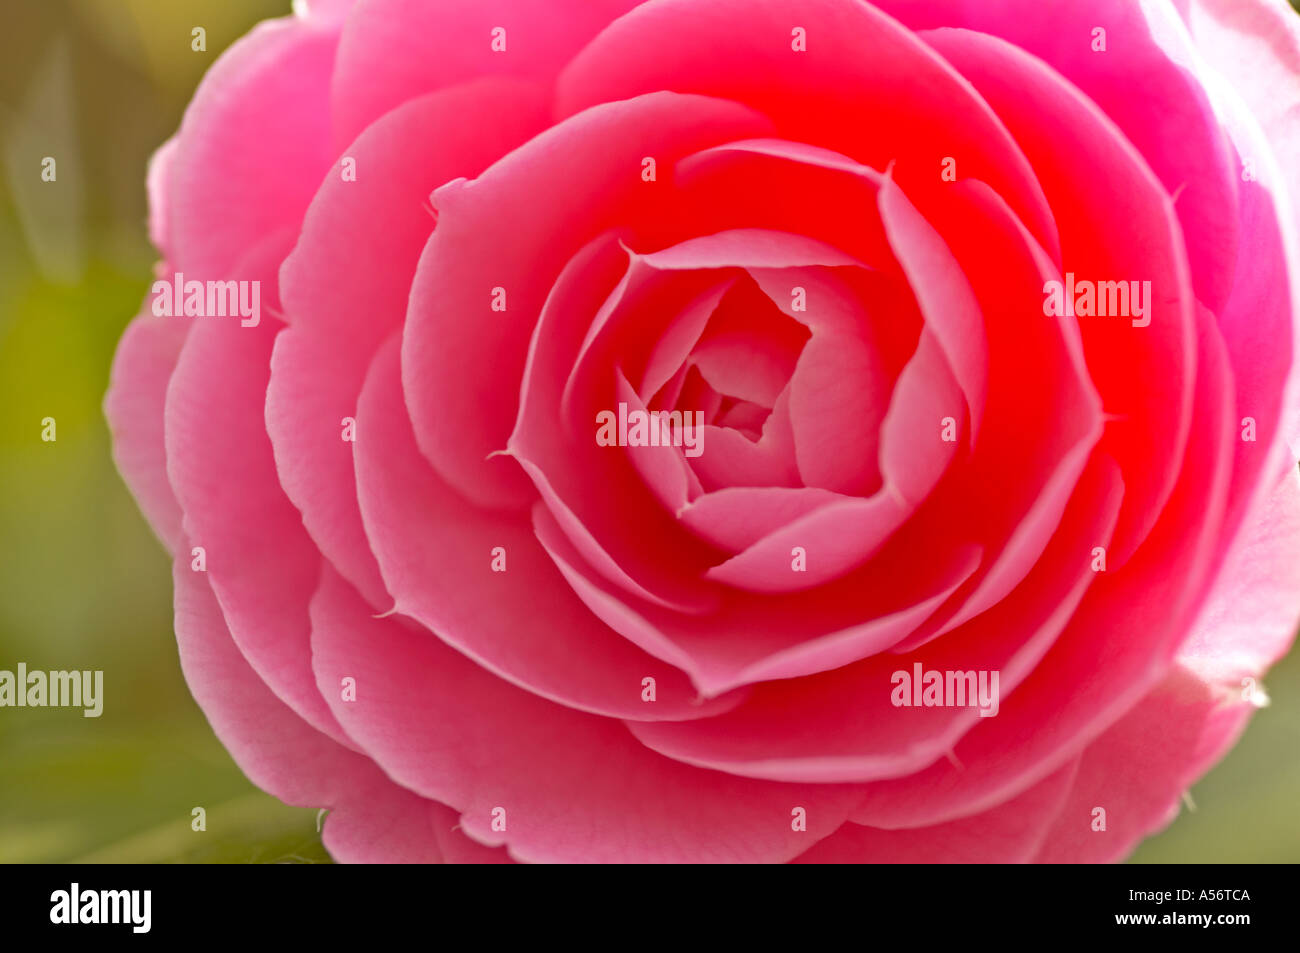 Camelia x williamsii E G Waterhouse in bloom - Stock Image